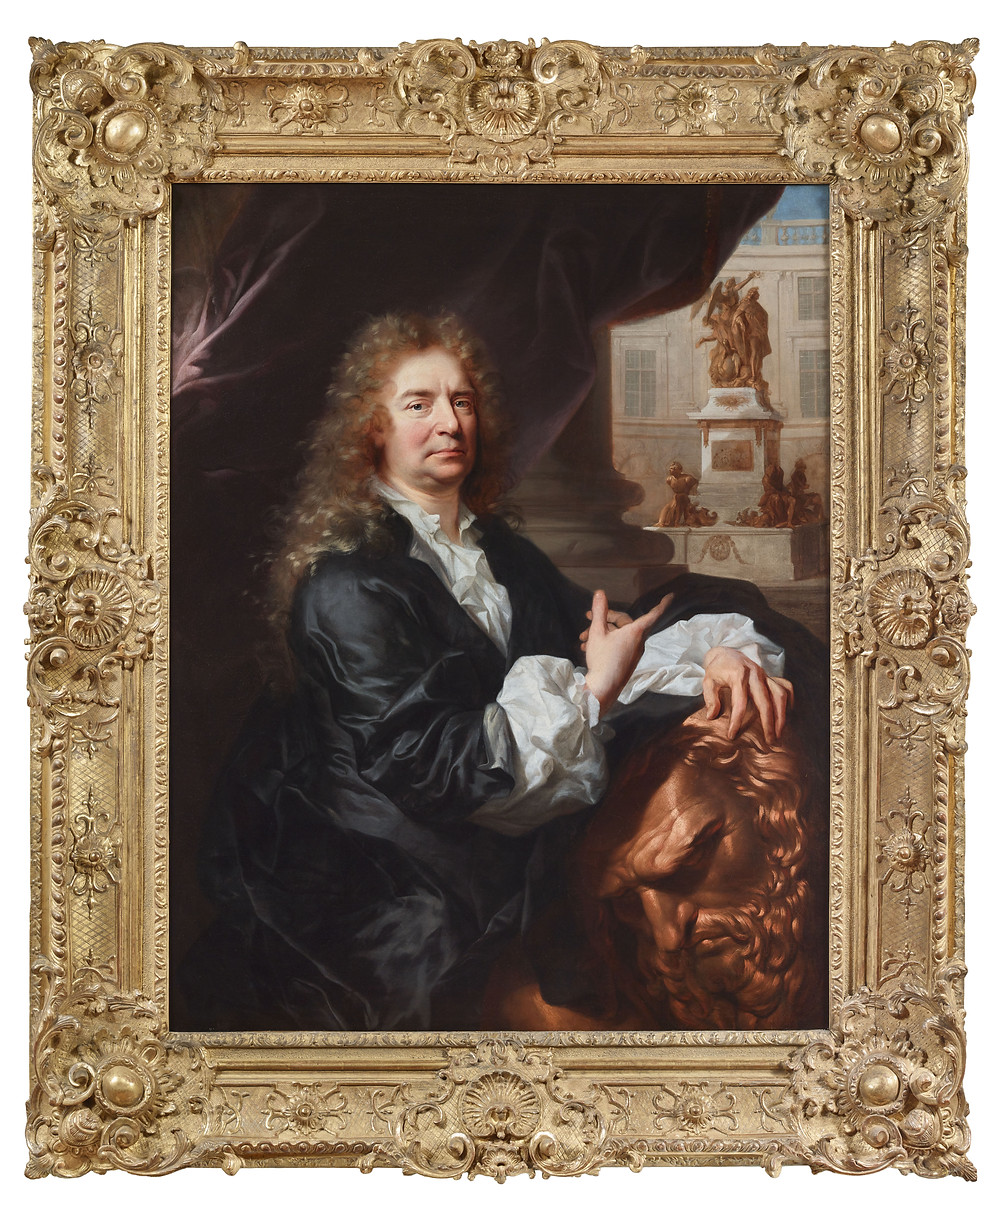 Hyacinthe Rigaud, Portrait du sculpteurMartin van den Bogaert dit Desjardins, vers 1686, avec son cadre actuel, Paris, Galerie Didier Aaron